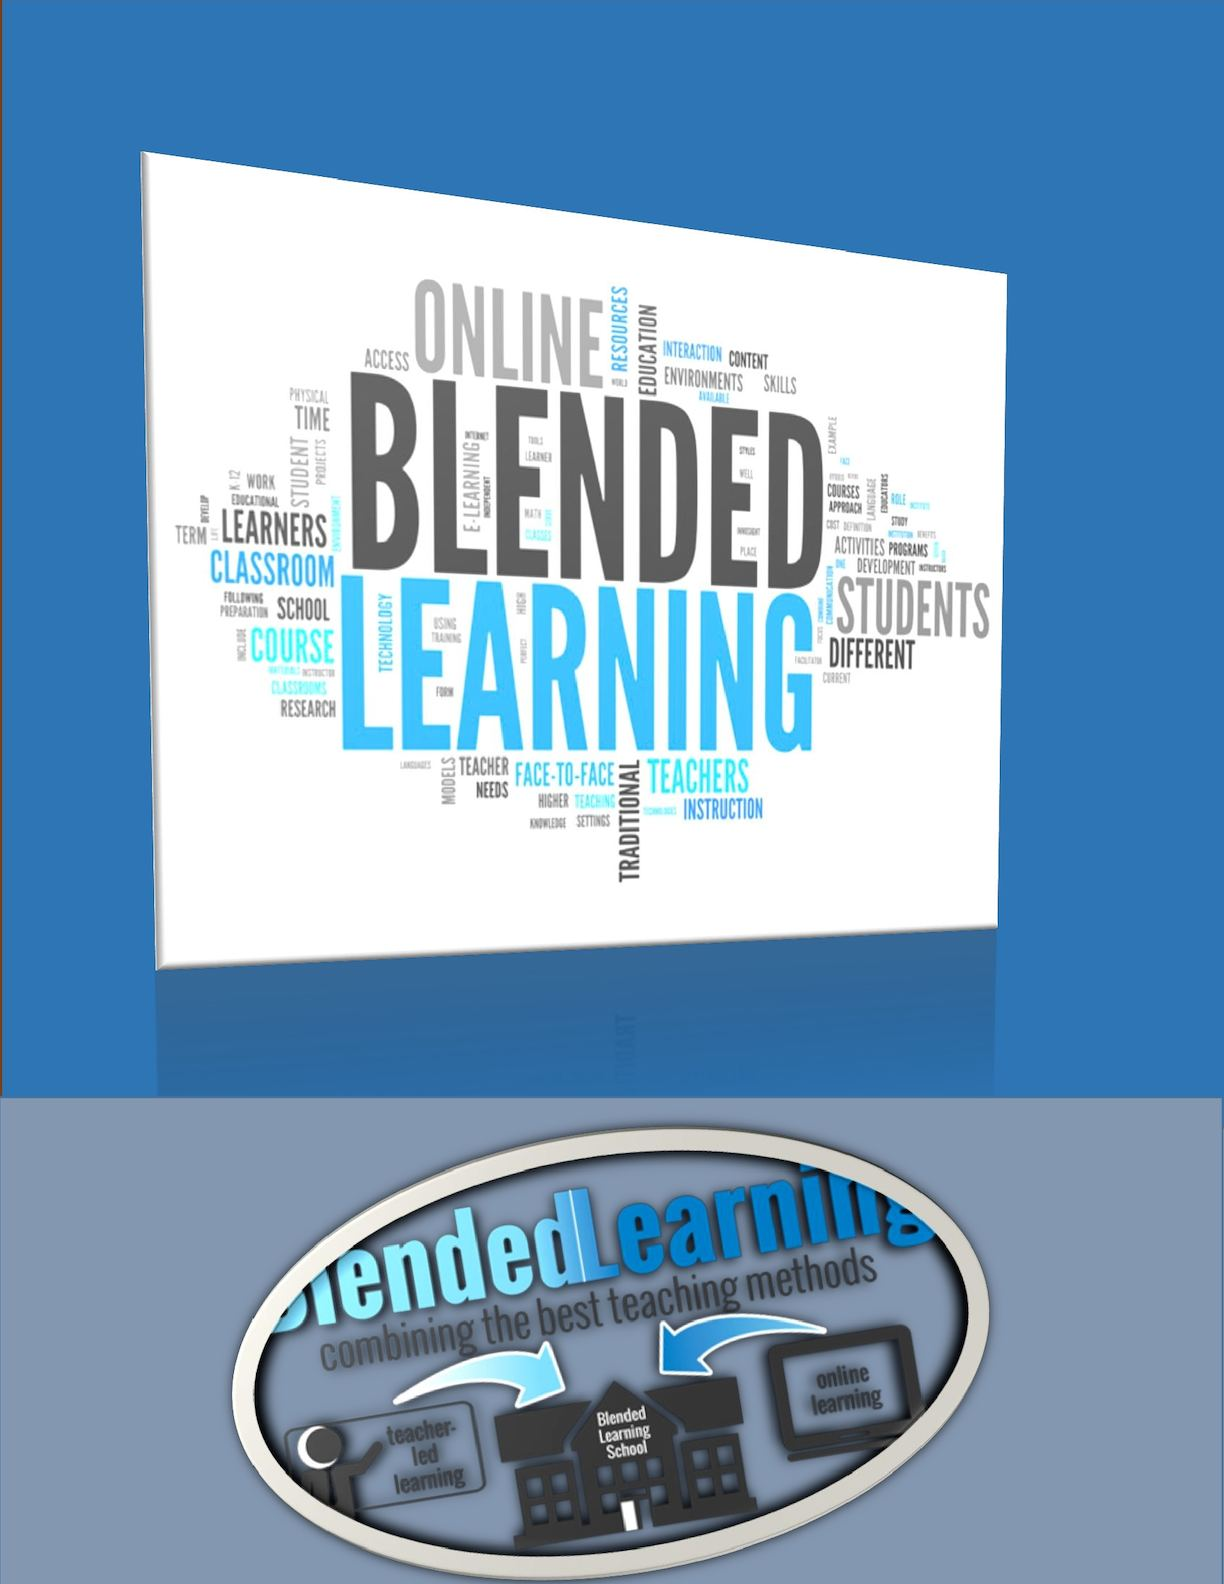 B-Learning